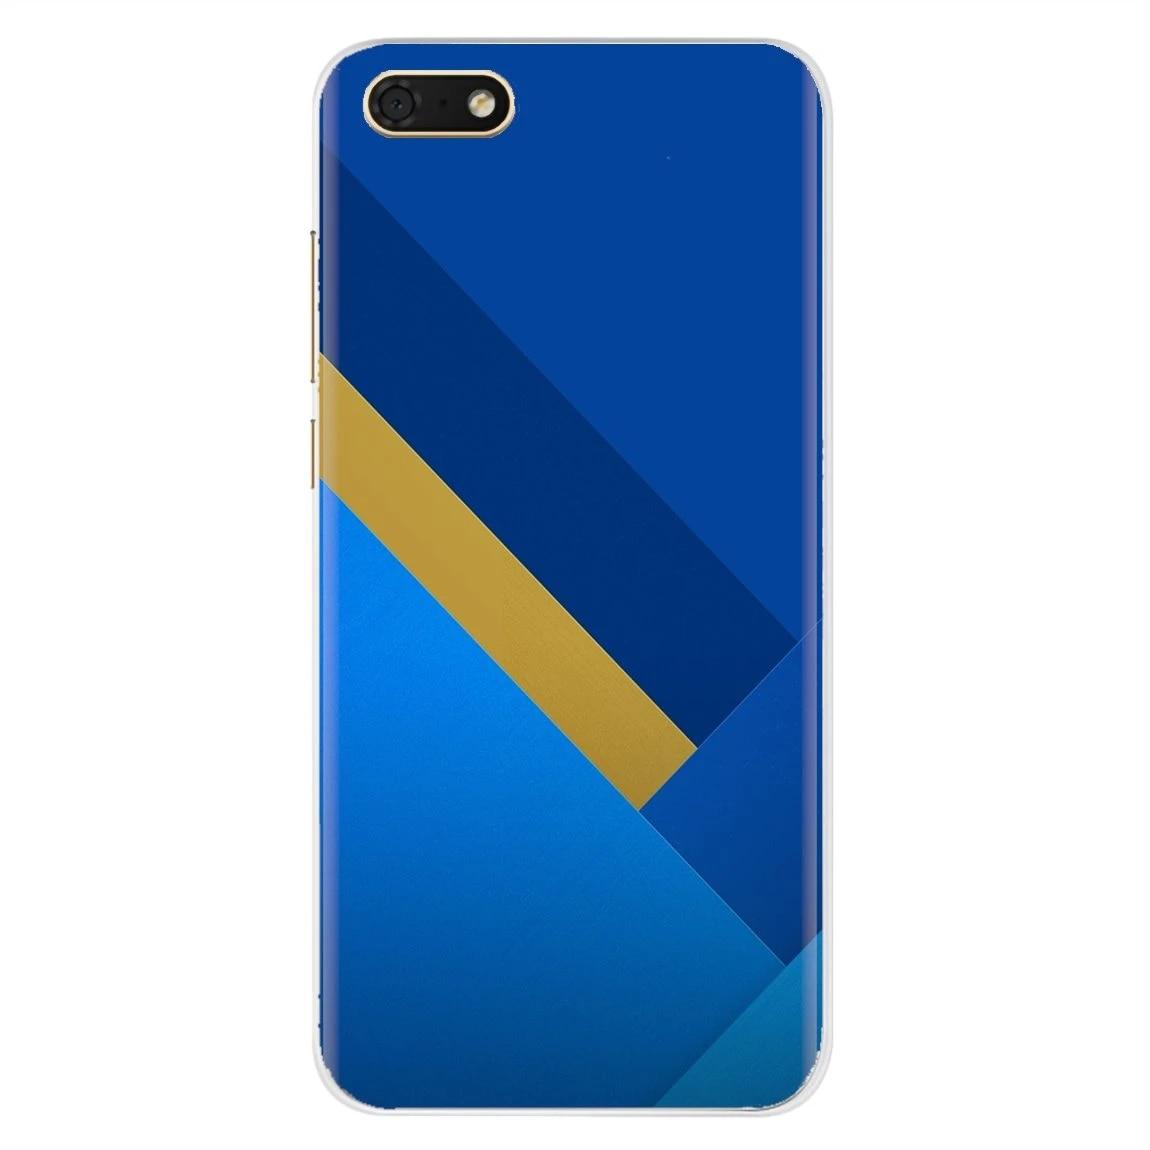 Movie 3 Am Live Wallpaper Smartphone Silicone Phone Case For Samsung Galaxy S6 Edge S10 Lite Plus Core Grand Prime Alpha J1 Mini Fitted Cases Aliexpress